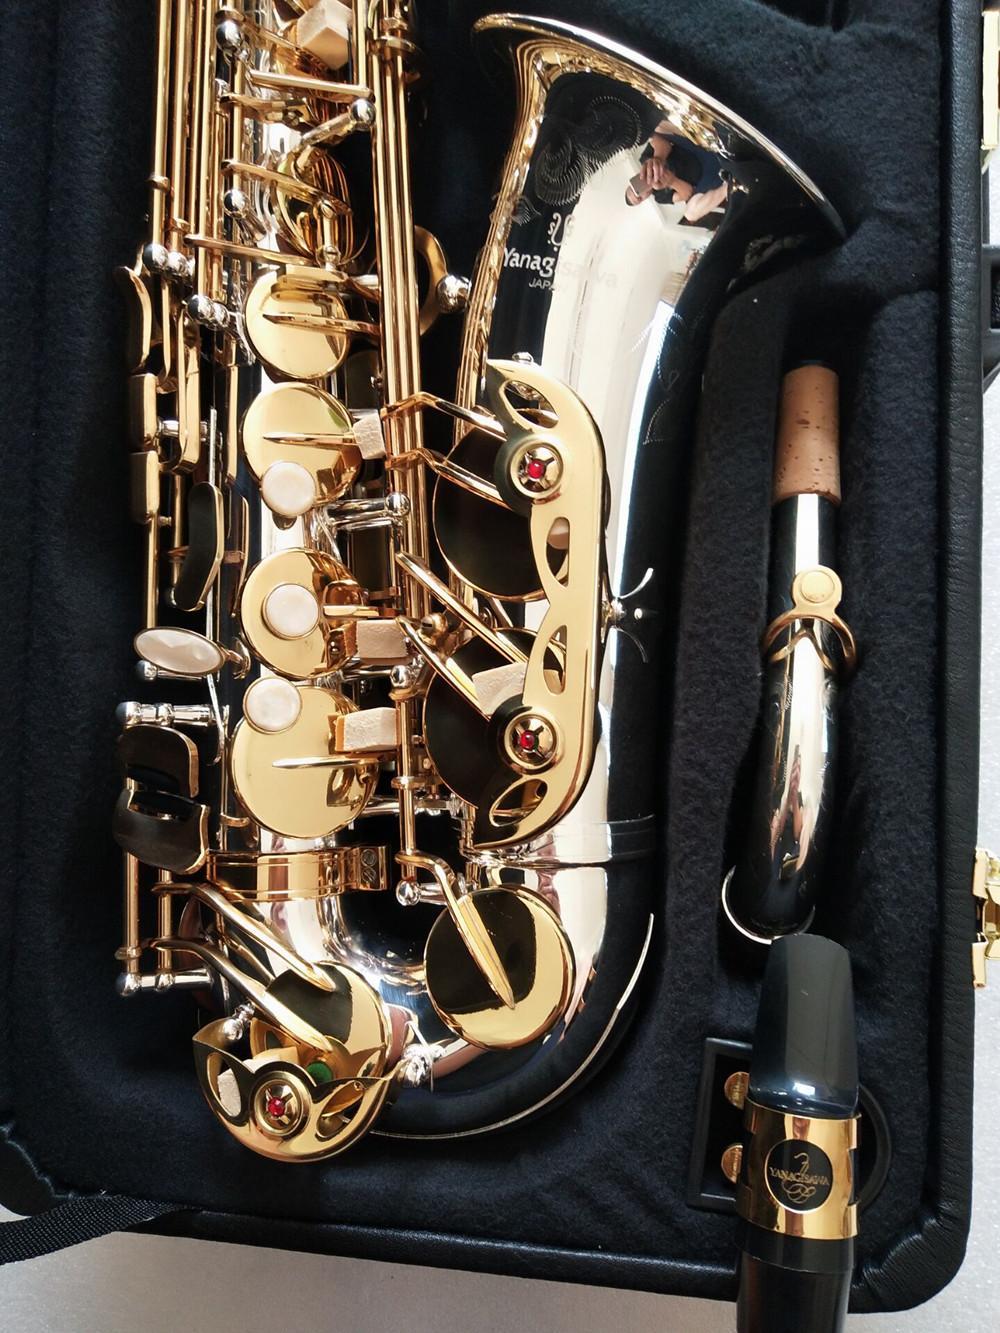 Yanagisawa A-W037 ألتو ساكسفون EB TNE BRASS الموسيقية النيكل الفضة مطلي الجسم الذهب ورنيش مفتاح ساكس مع حالة لسان حال